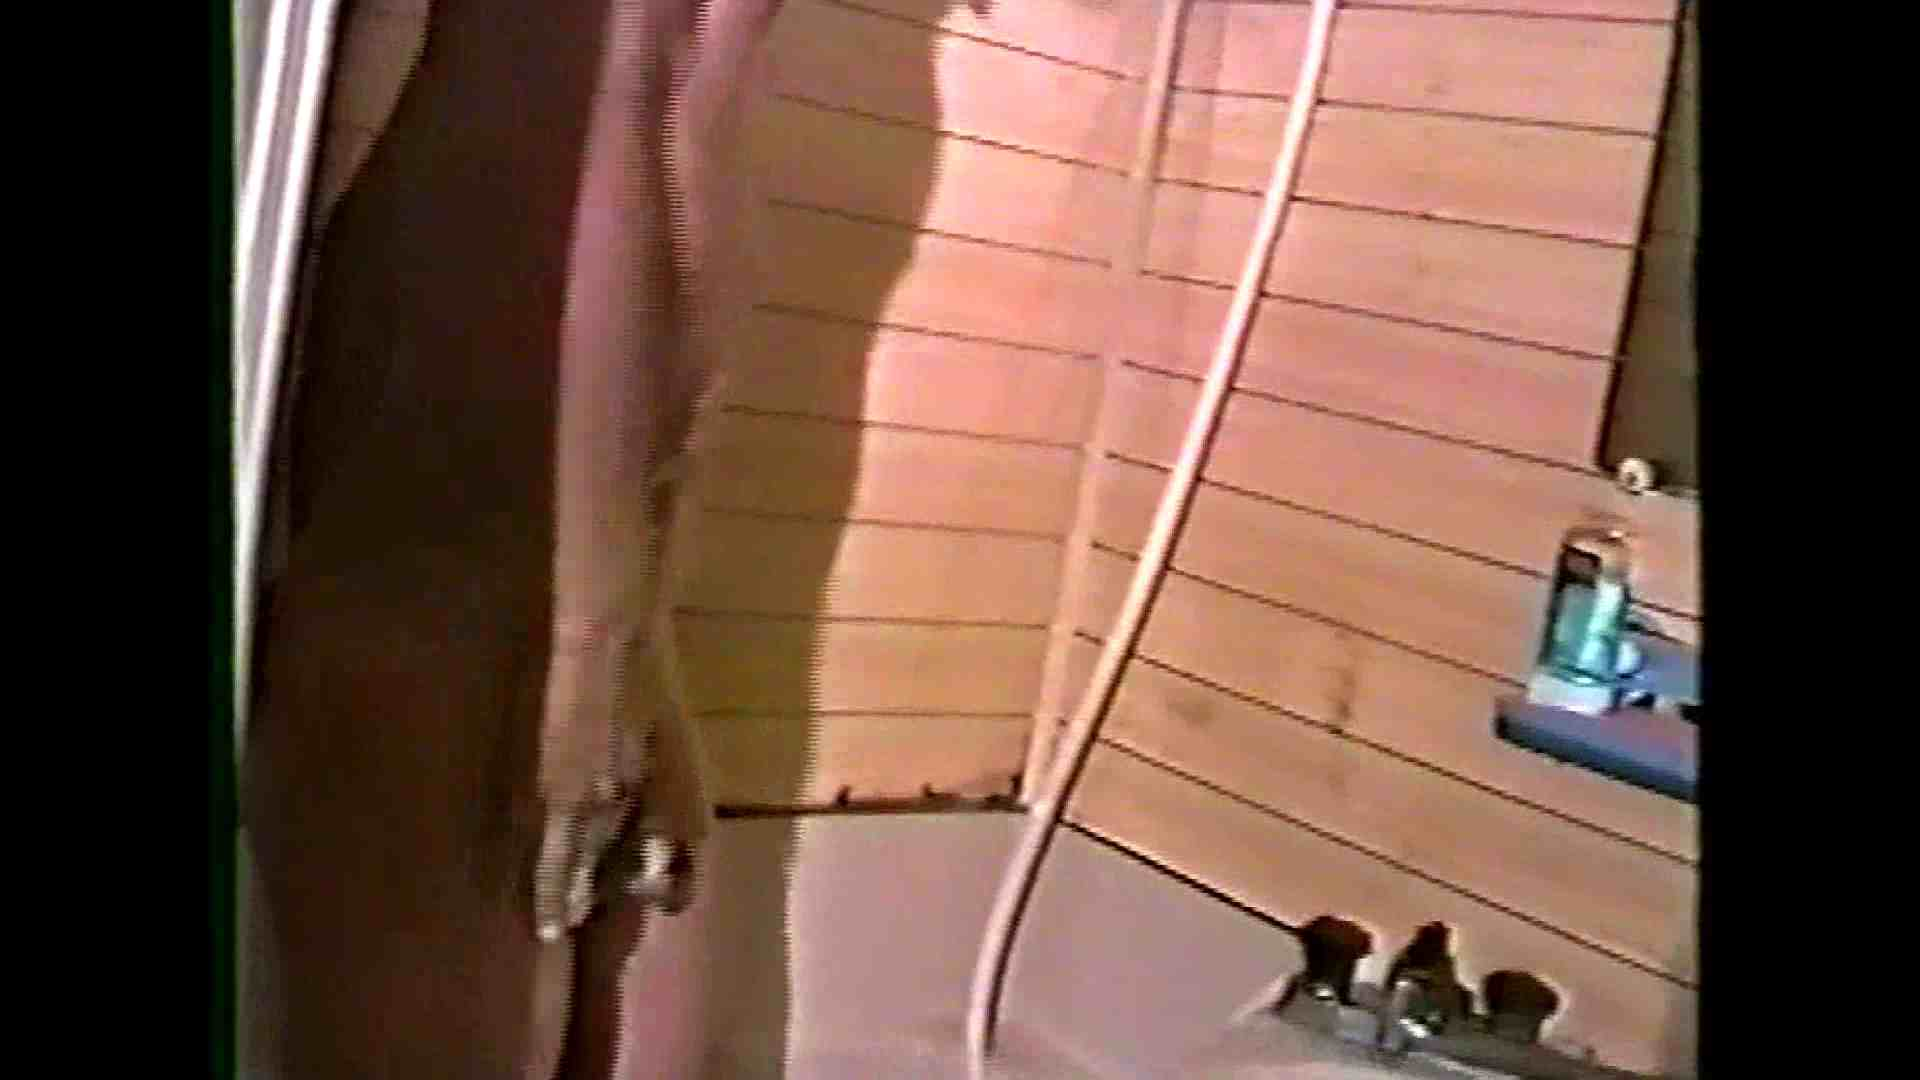 MADOKAさんのズリネタコレクションVol.3-1 名作・話題作 | オムニバス  101pic 59